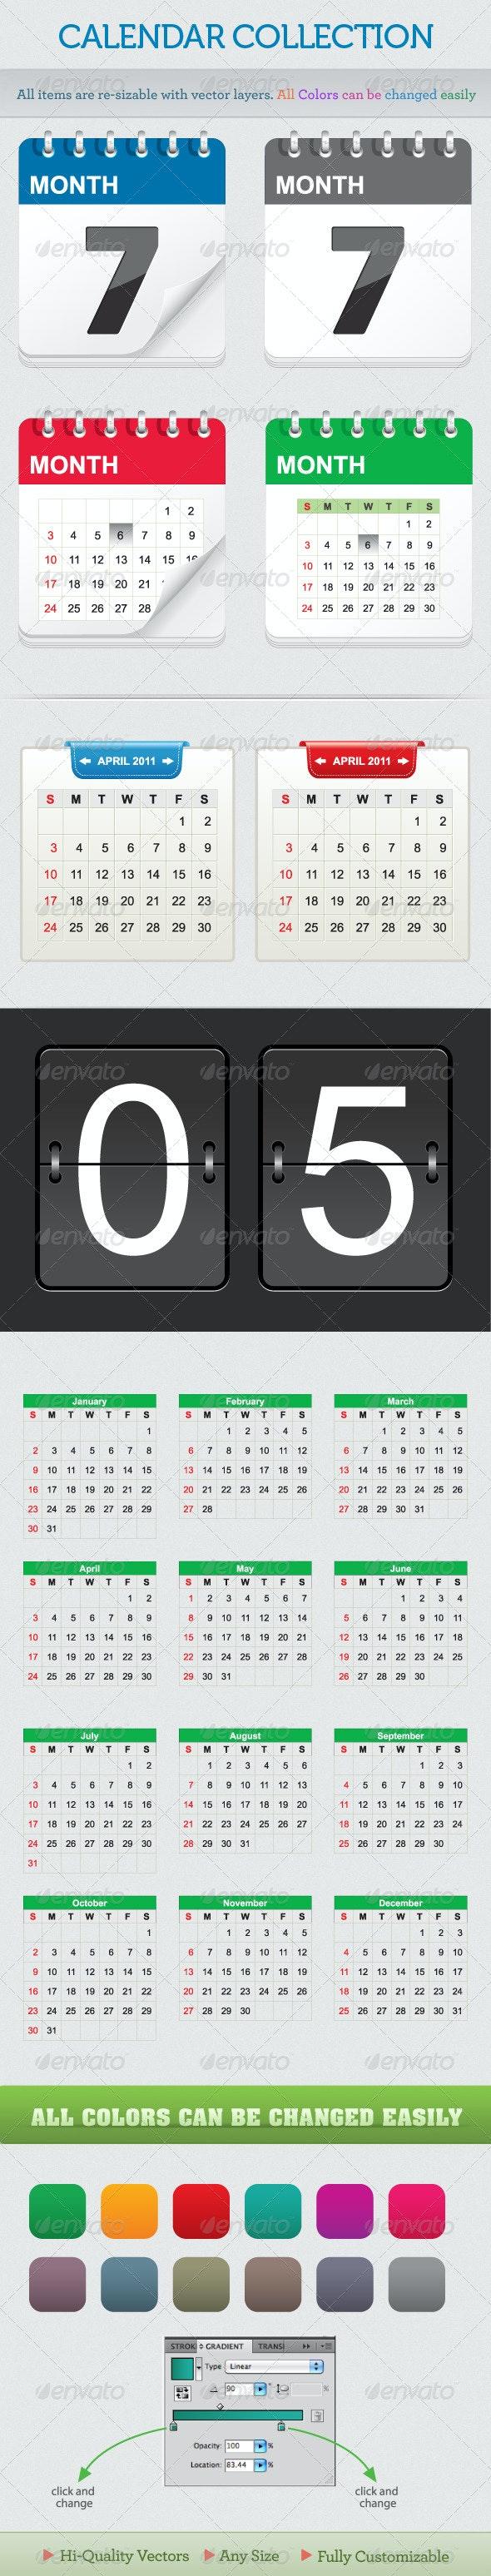 Calendar Collection - Web Elements Vectors